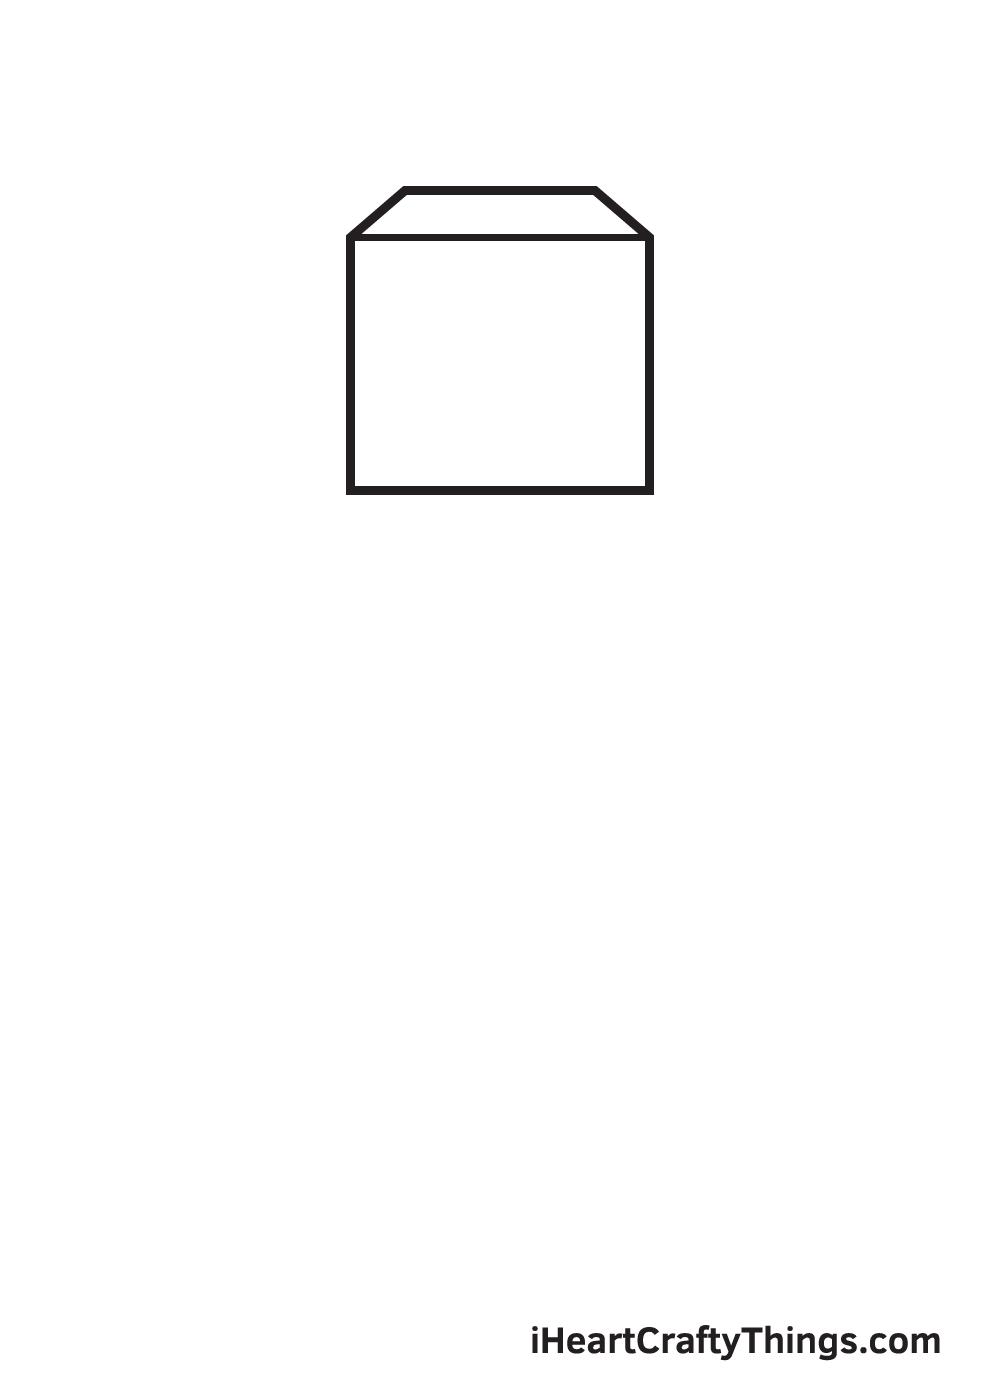 minecraft drawing step 1